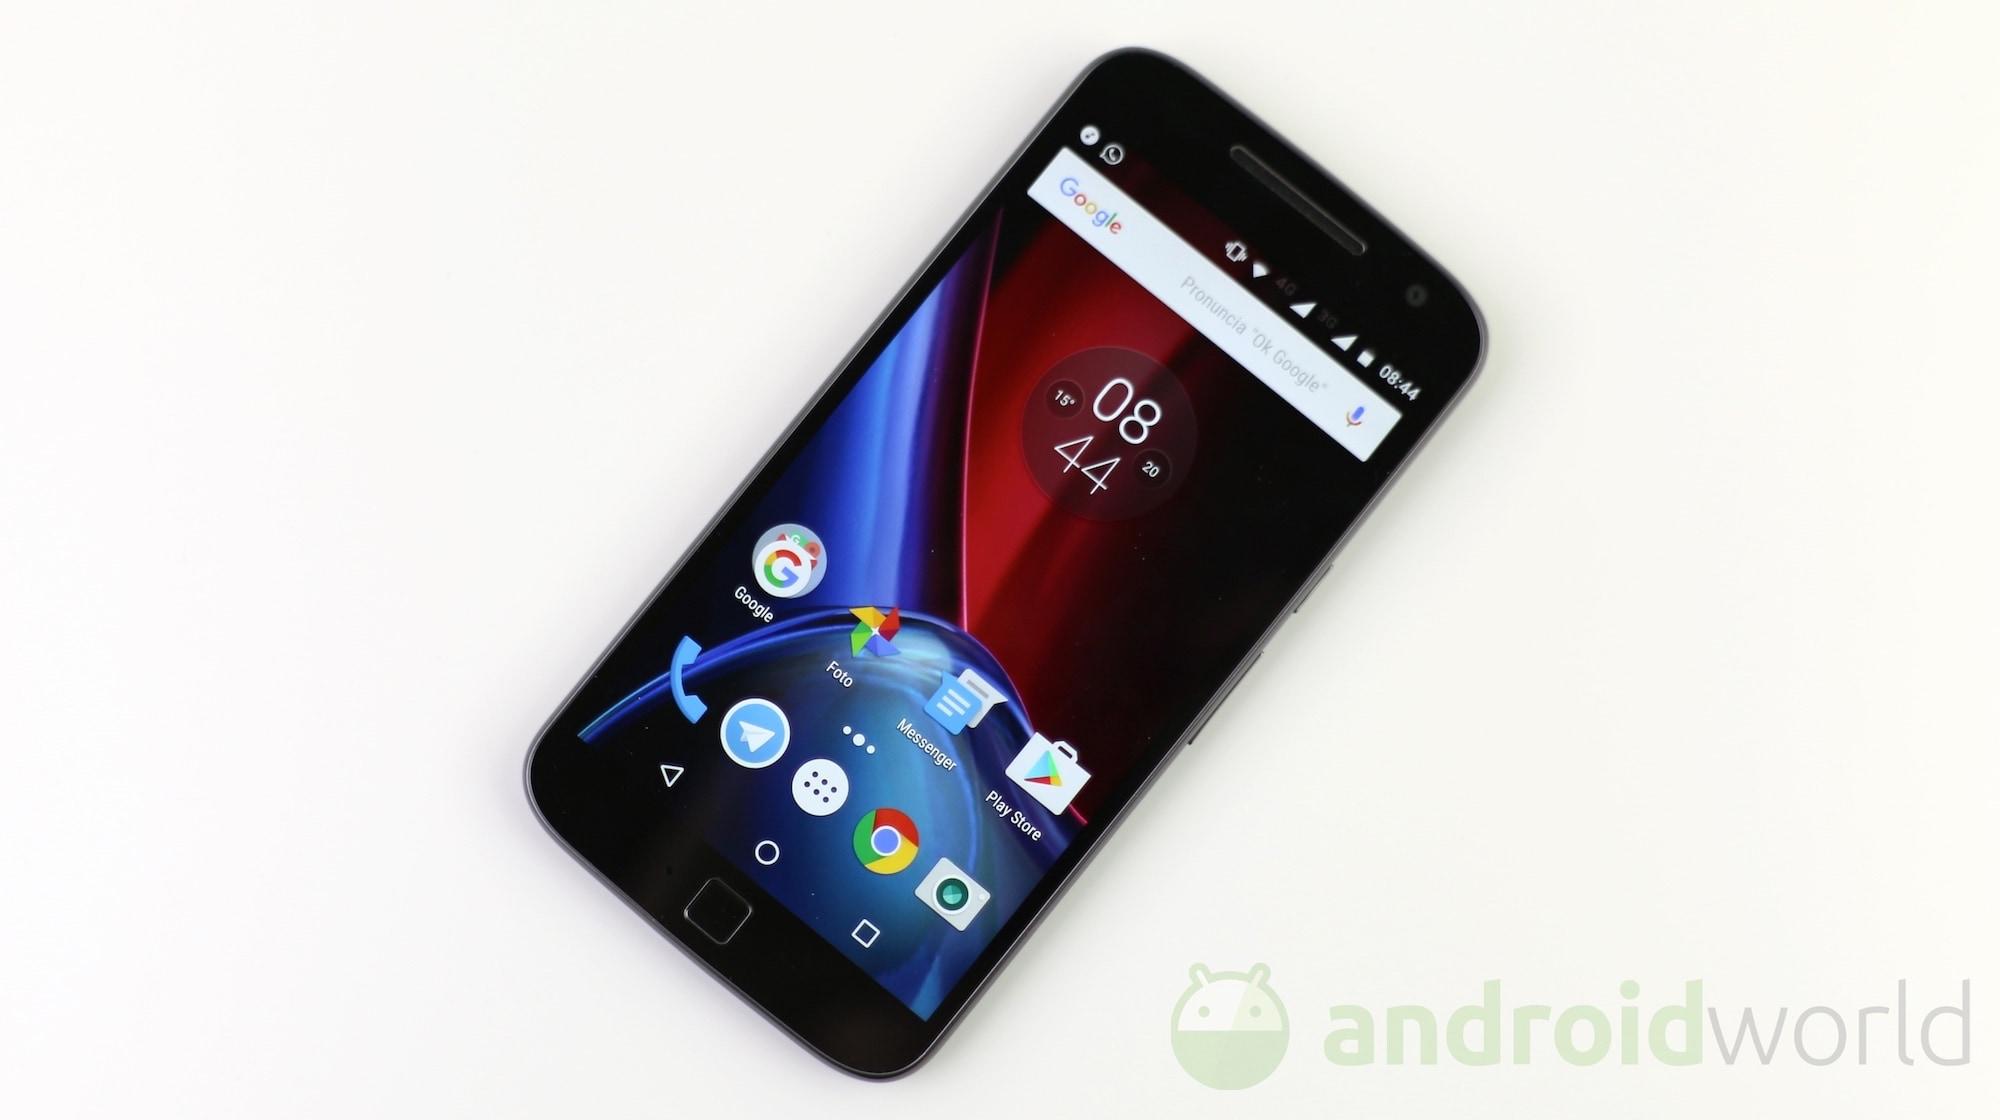 Lenovo Moto G4 in the Test: No Chubbie!